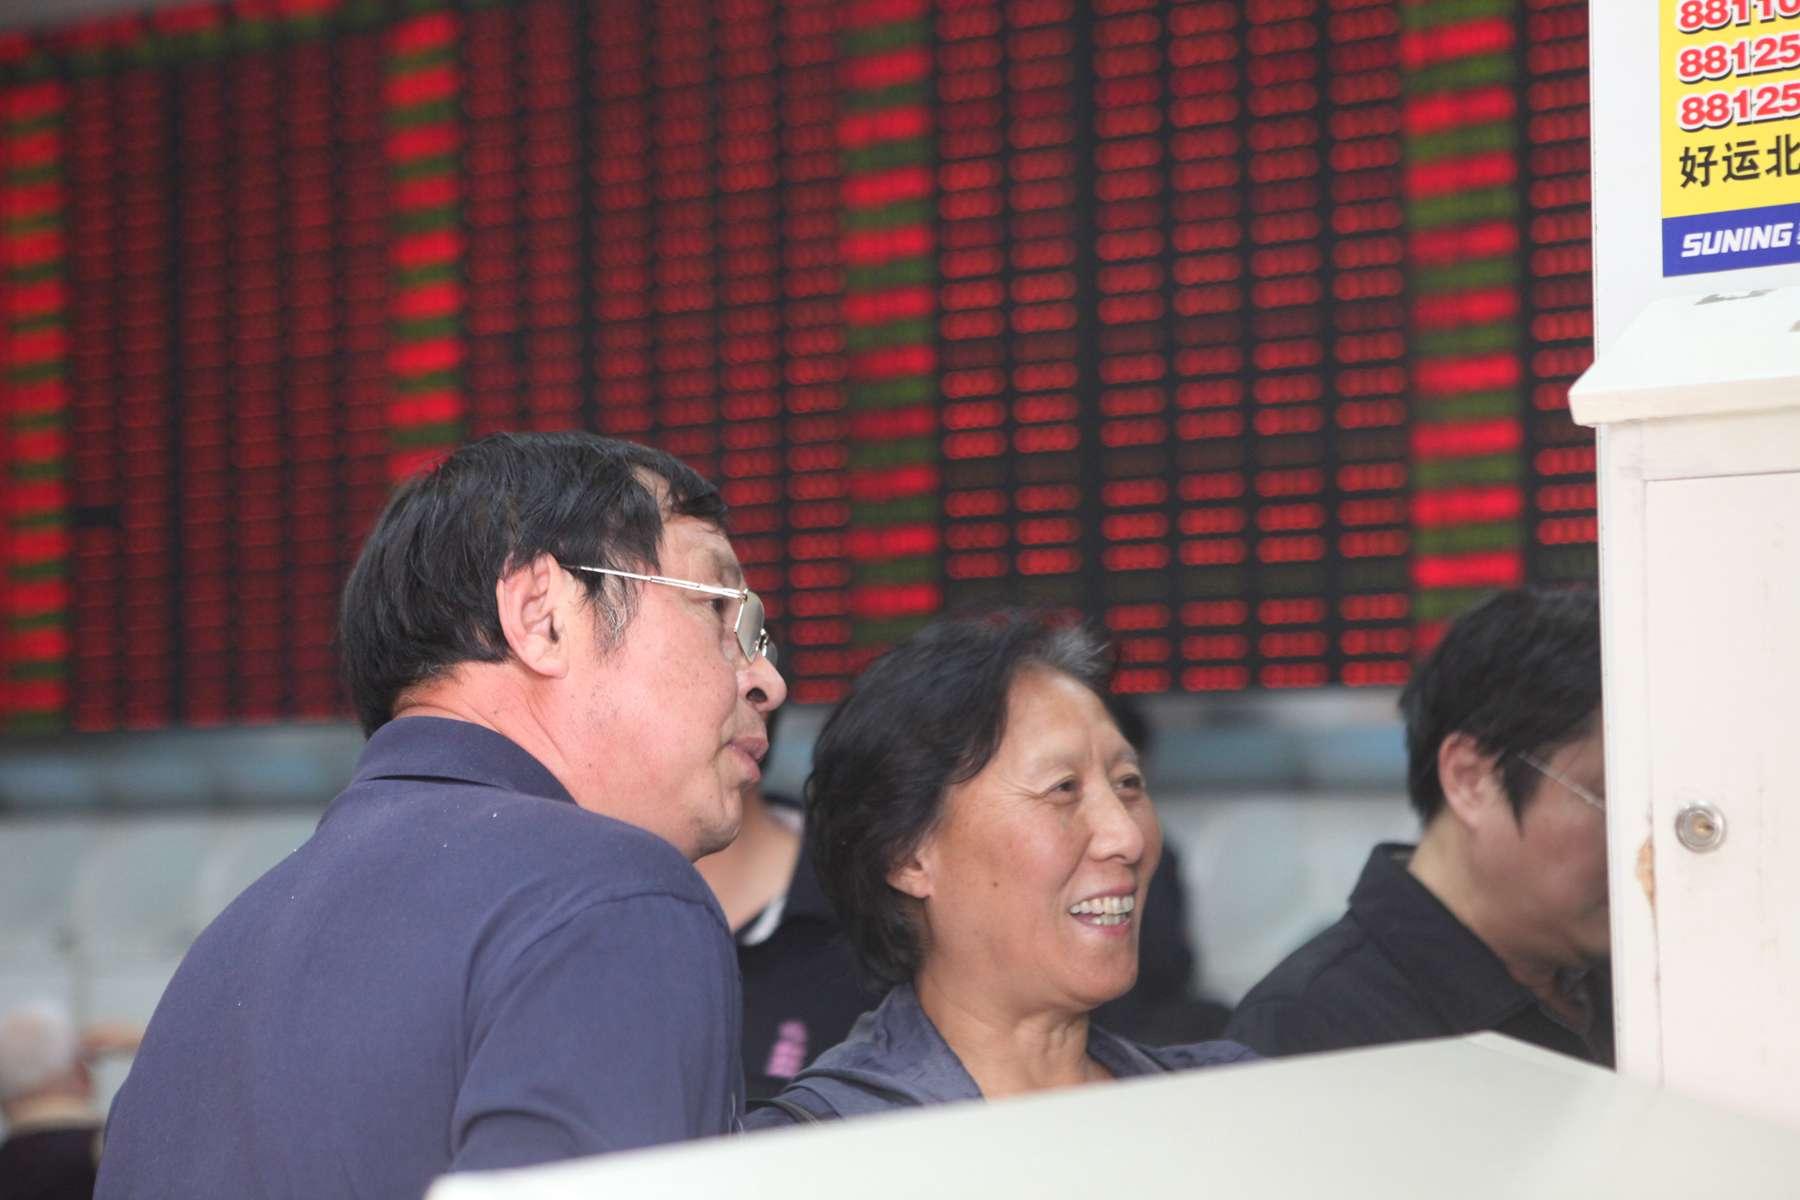 China Hushen 300 index futures close higher Friday